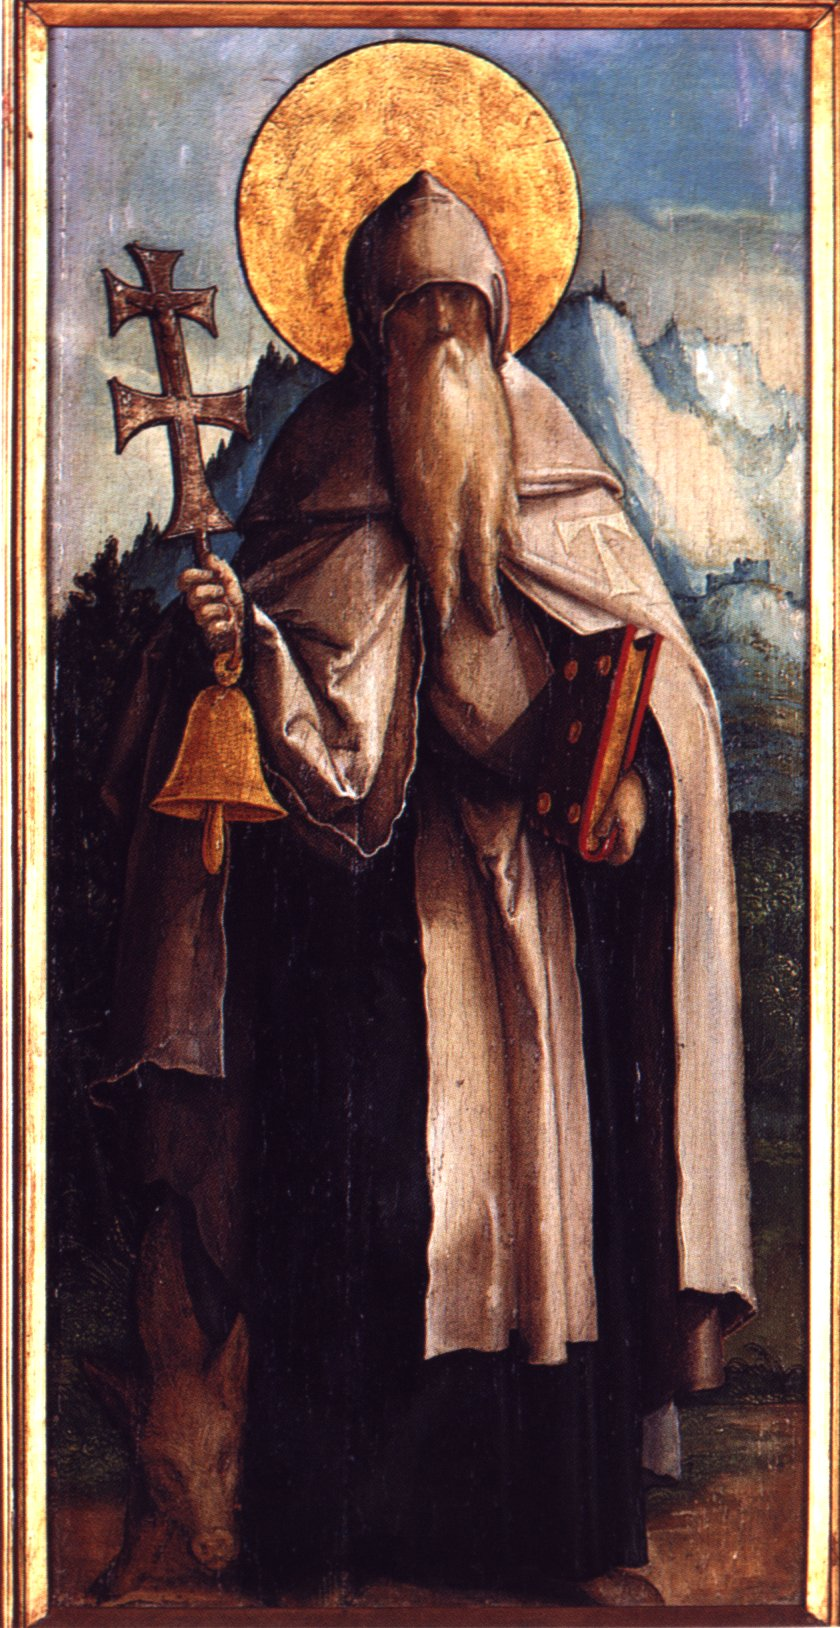 File:Heiliger Antonius Abbas.jpg - Wikimedia Commons